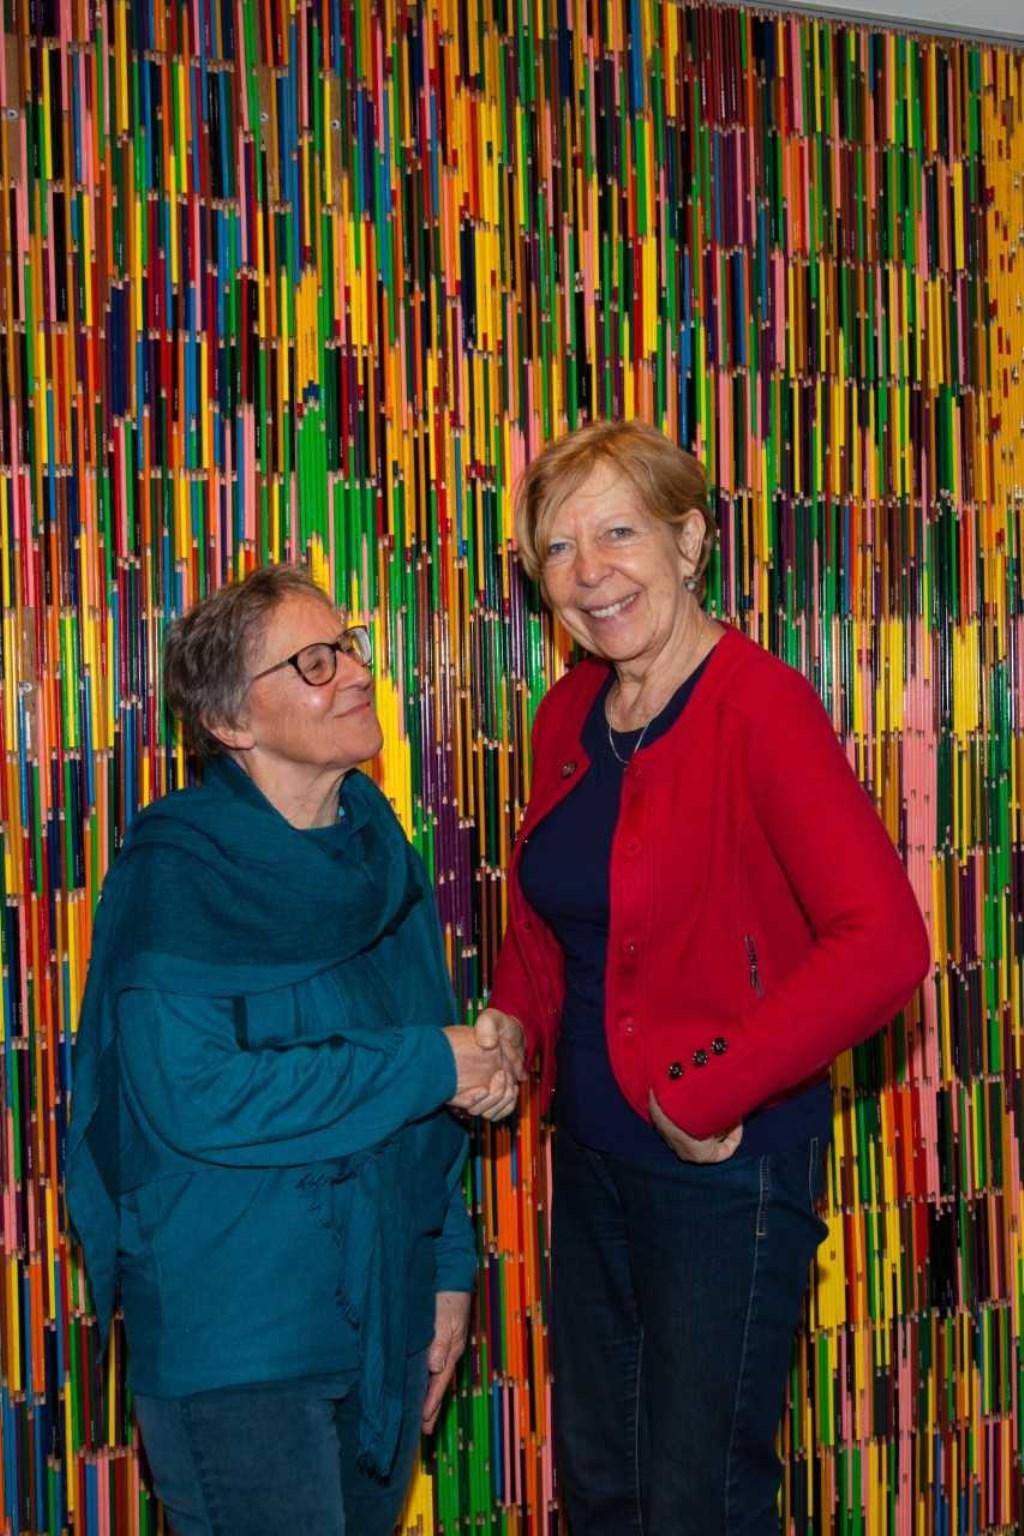 Links Nienke Witkamp en rechts Jellie Wiersma